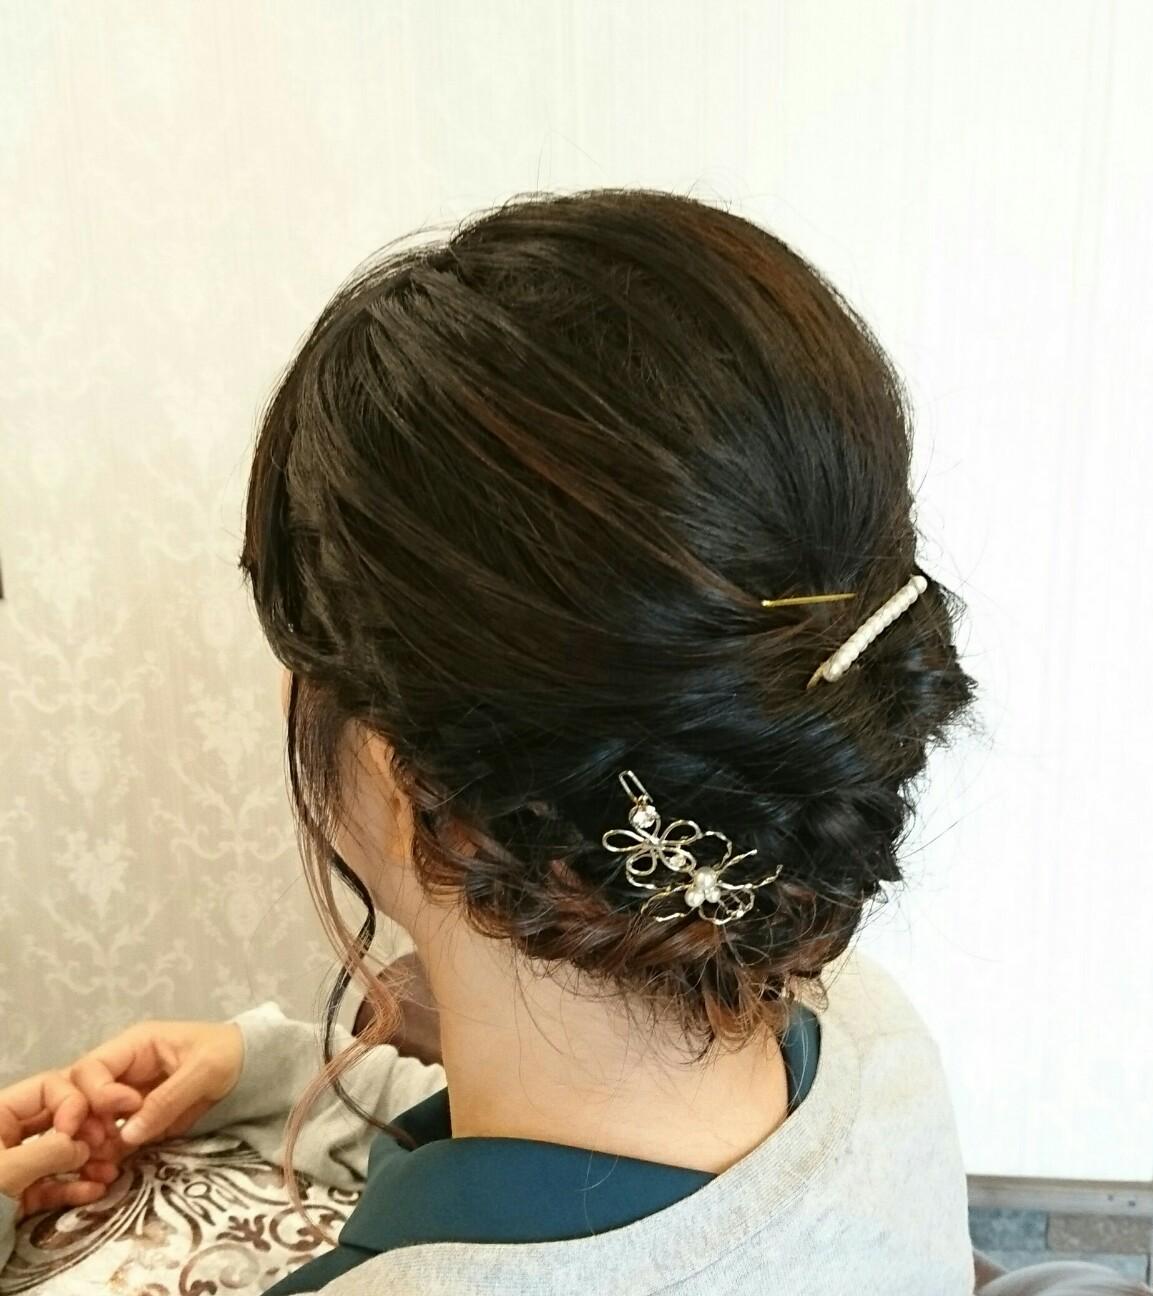 f:id:aquayukino:20180916010822j:image